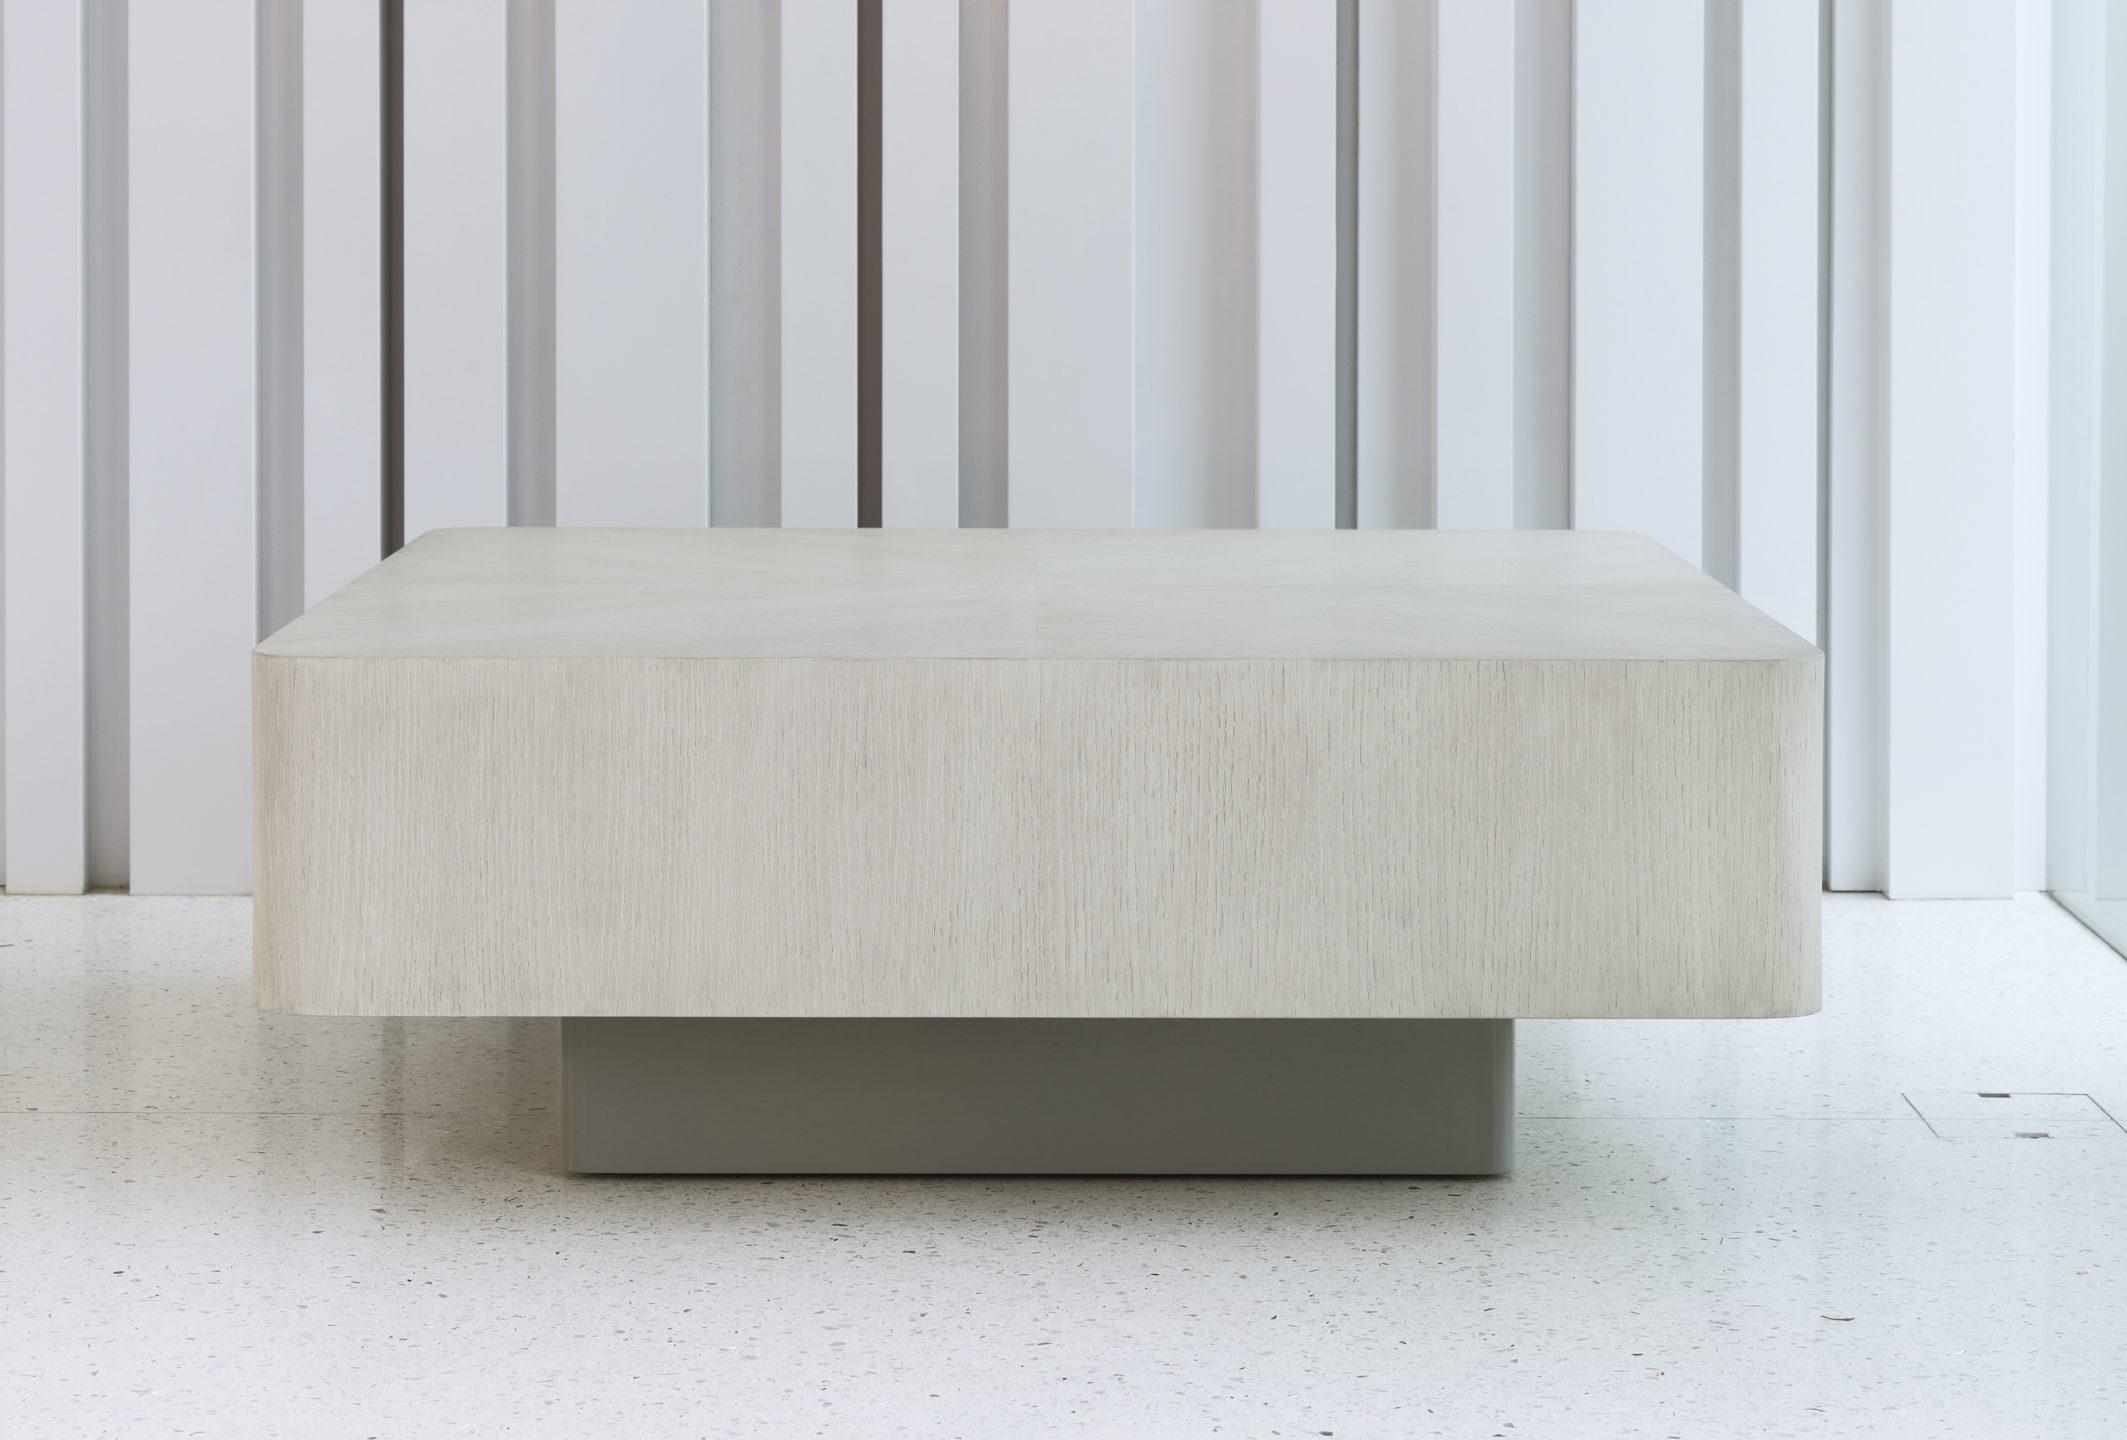 Studio_William_Hefner_products_leia_coffee_table_2